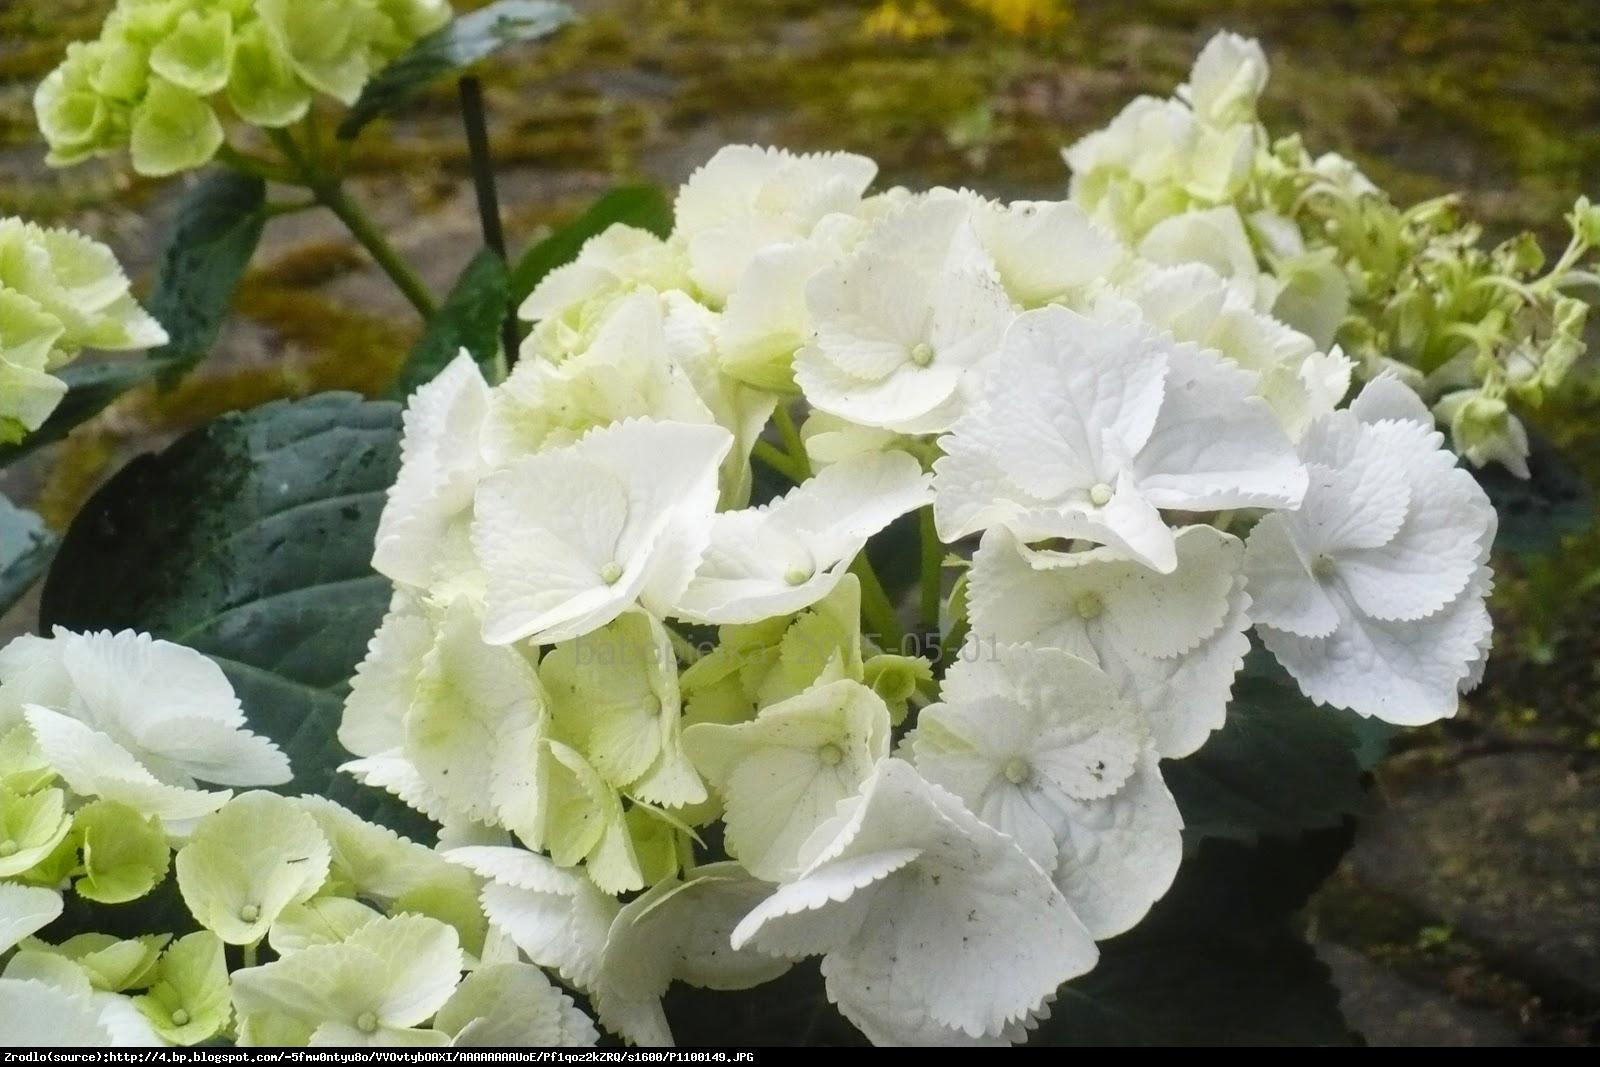 Hortensja ogrodowa Clarissa - Hydrangea macrophylla  Clarissa